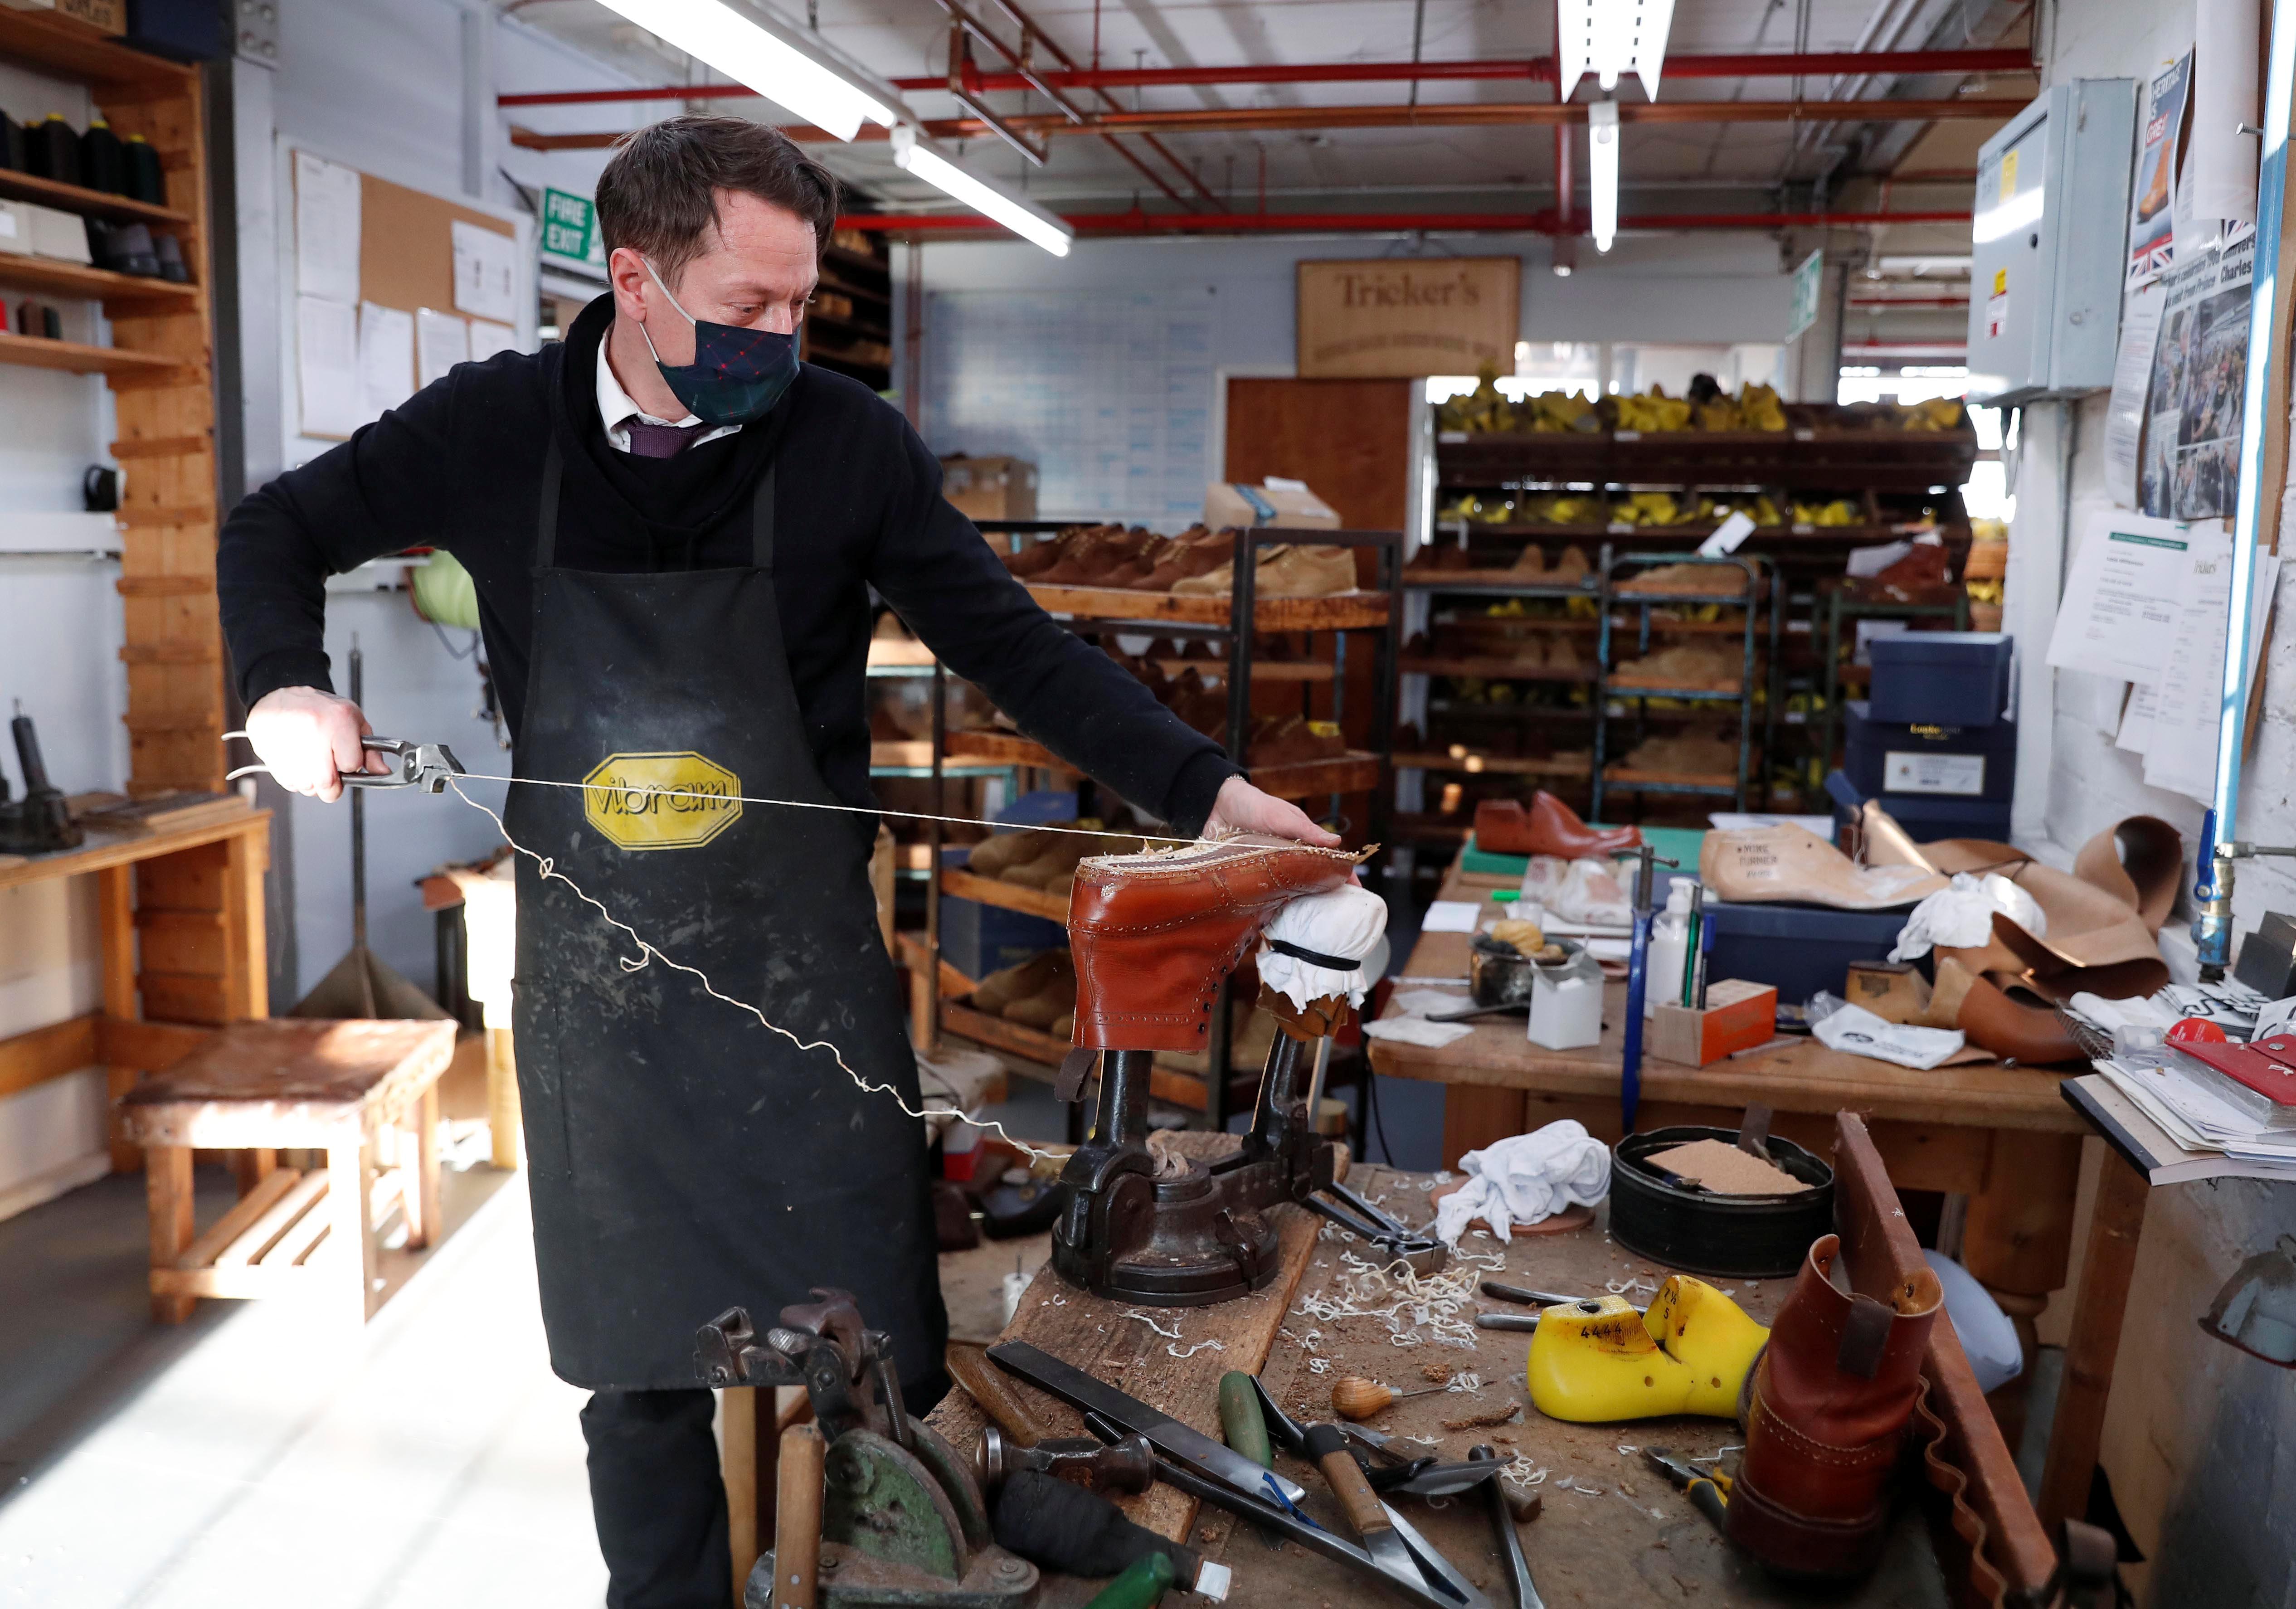 Master Bespoke Shoemaker Scott McKee repairs a shoe at Trickers in Northampton, Britain, January 25, 2021. REUTERS/Matthew Childs